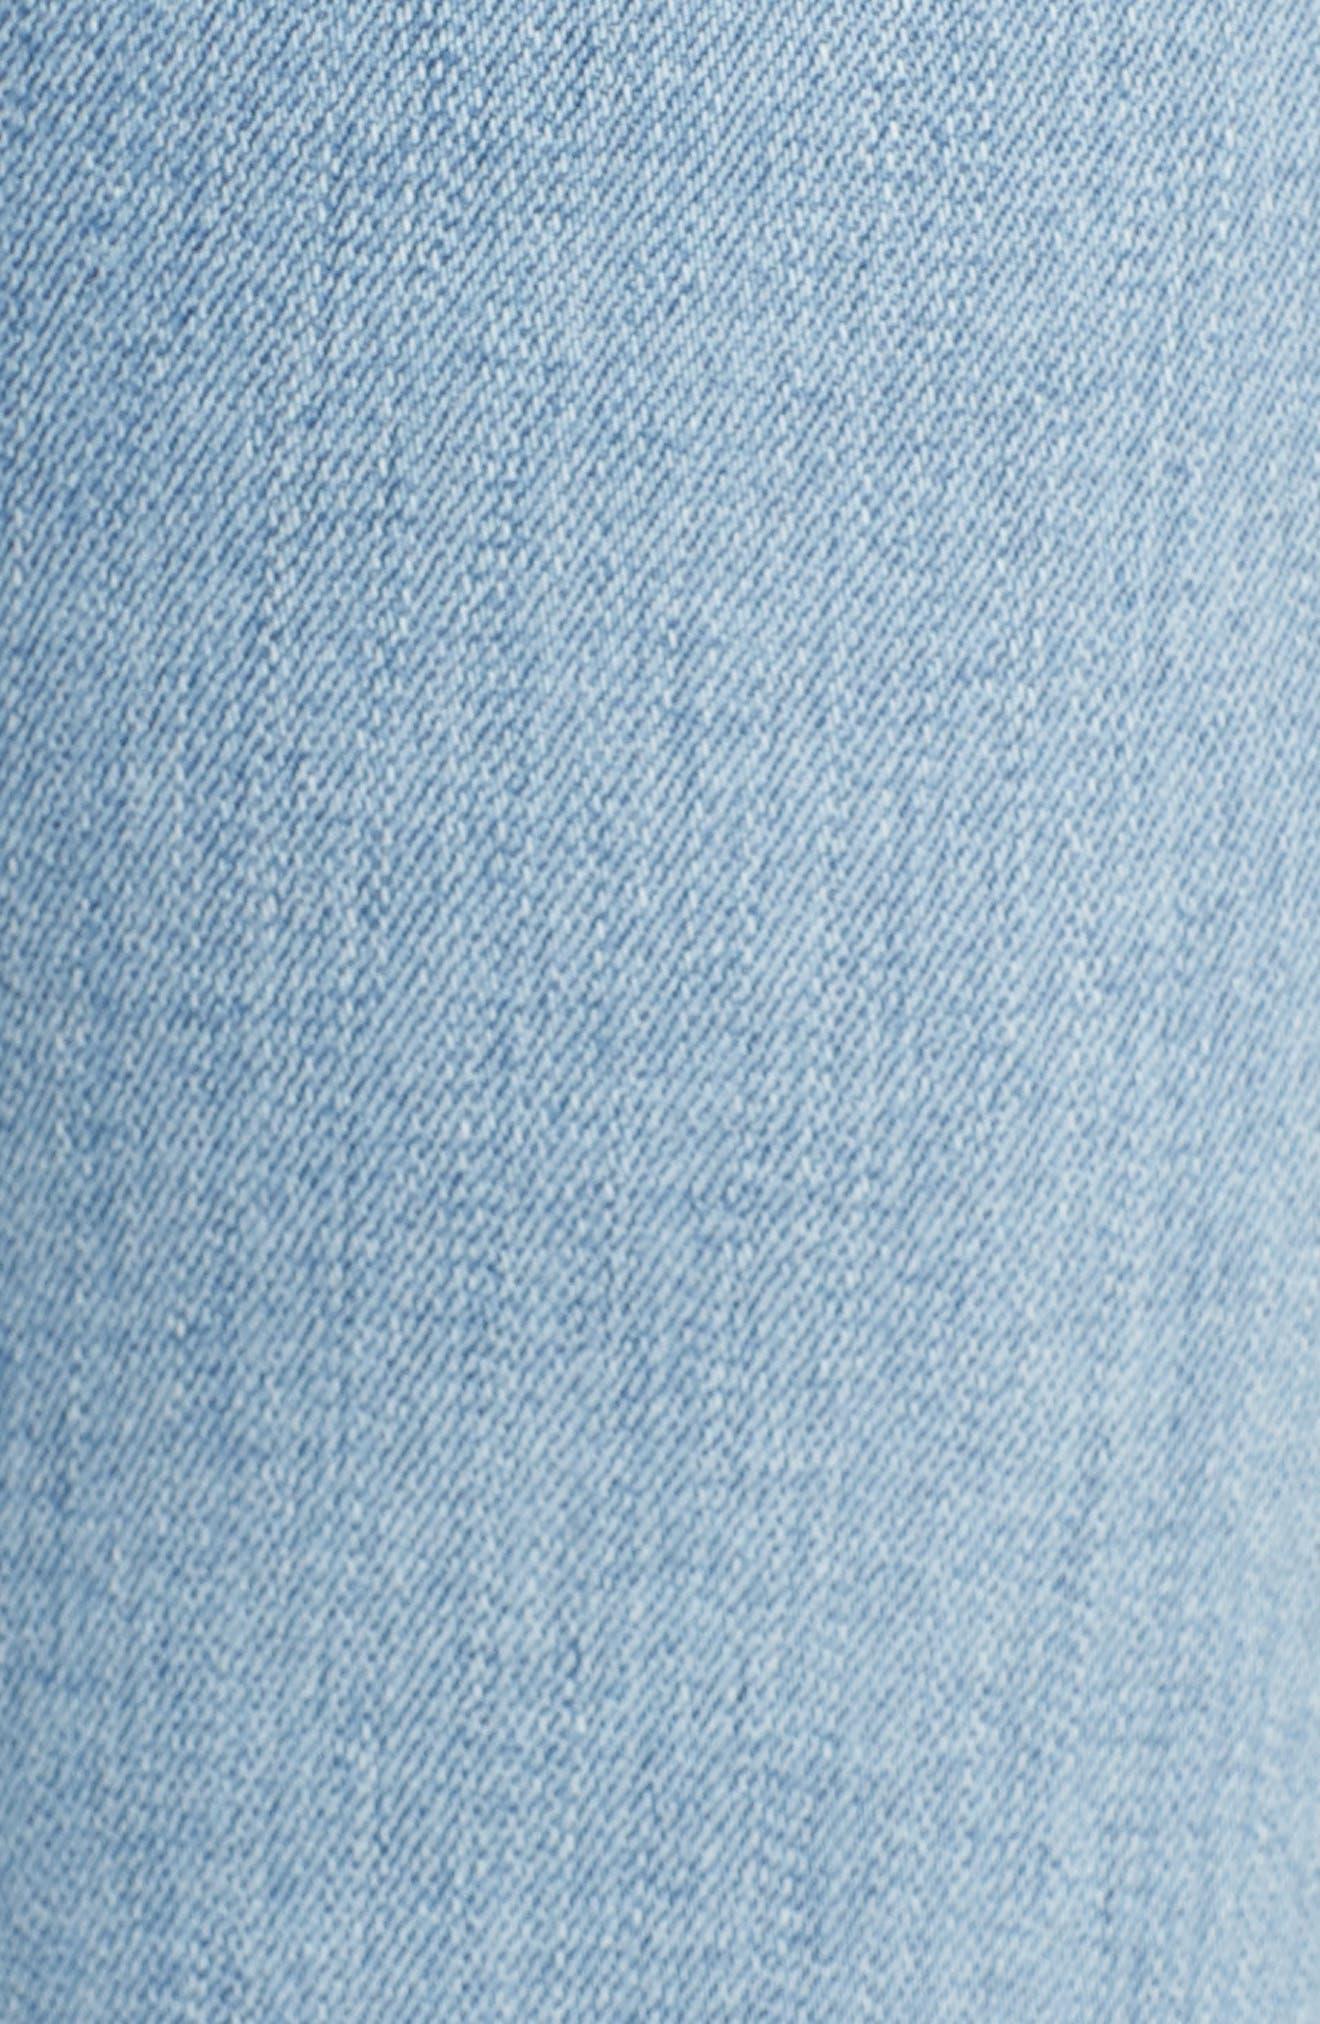 Tally Cuffed Crop Skinny Jeans,                             Alternate thumbnail 6, color,                             Gemini